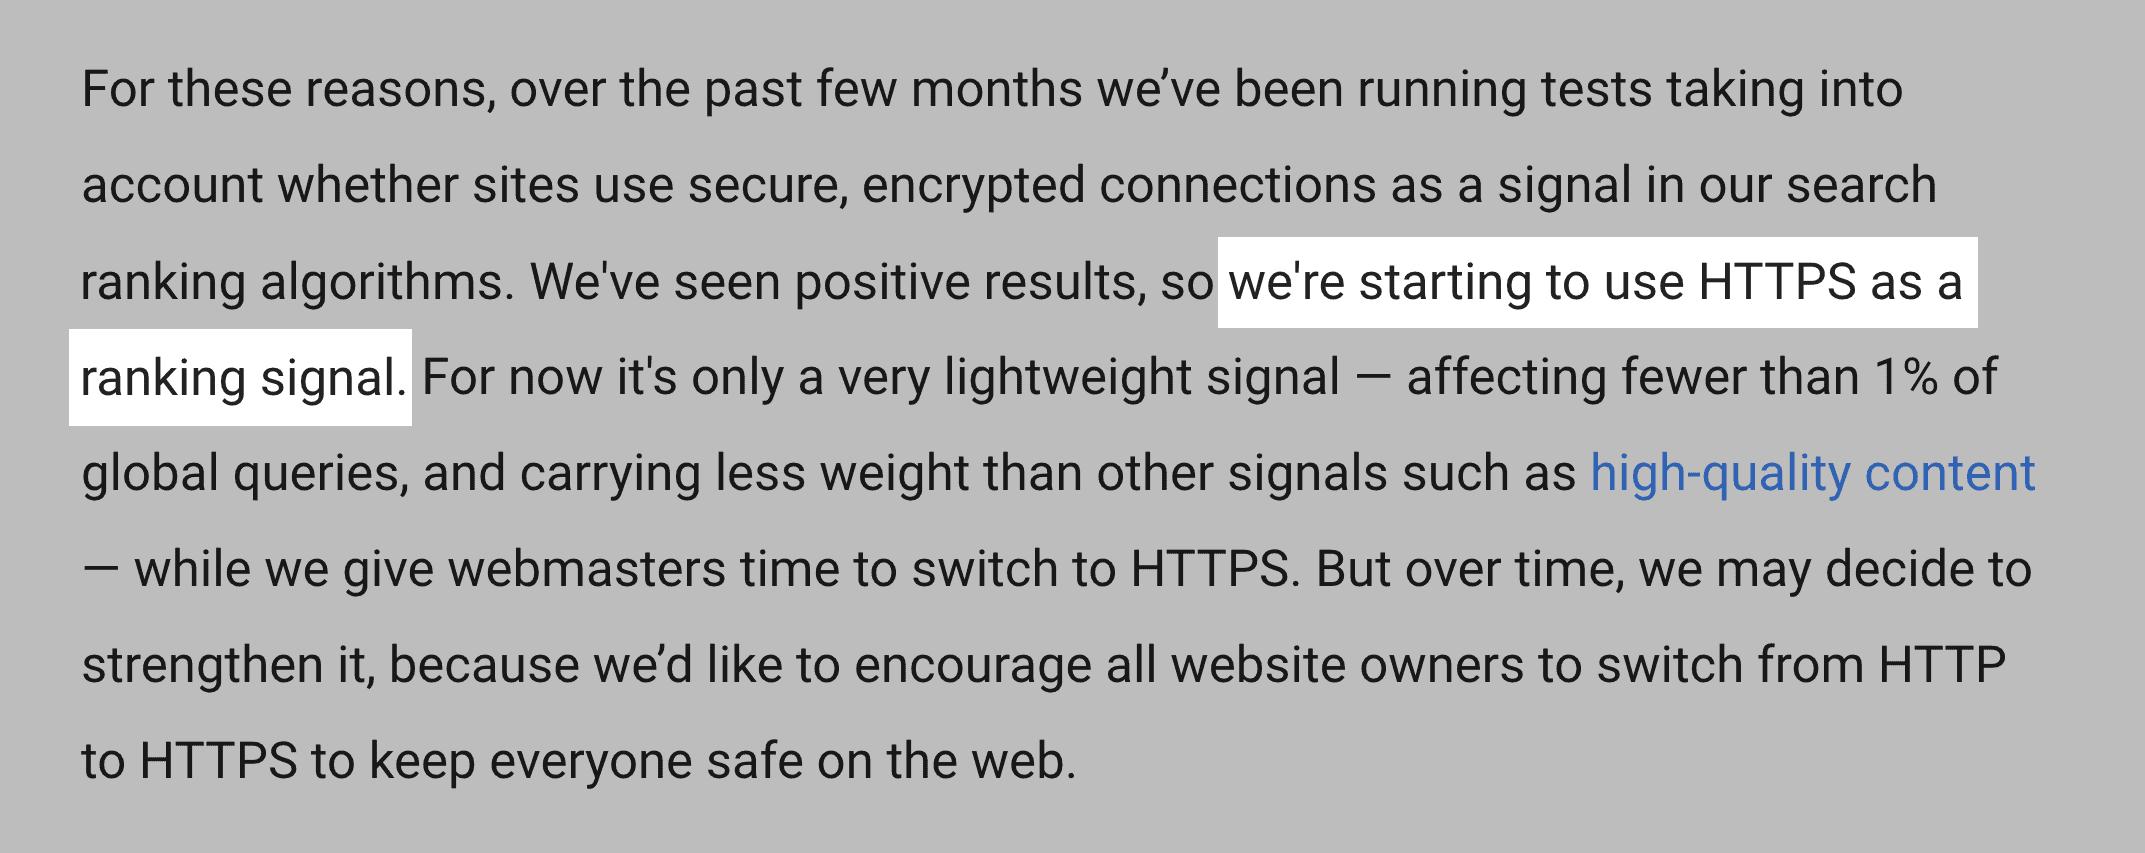 HTTPS sites have a ranking advantage